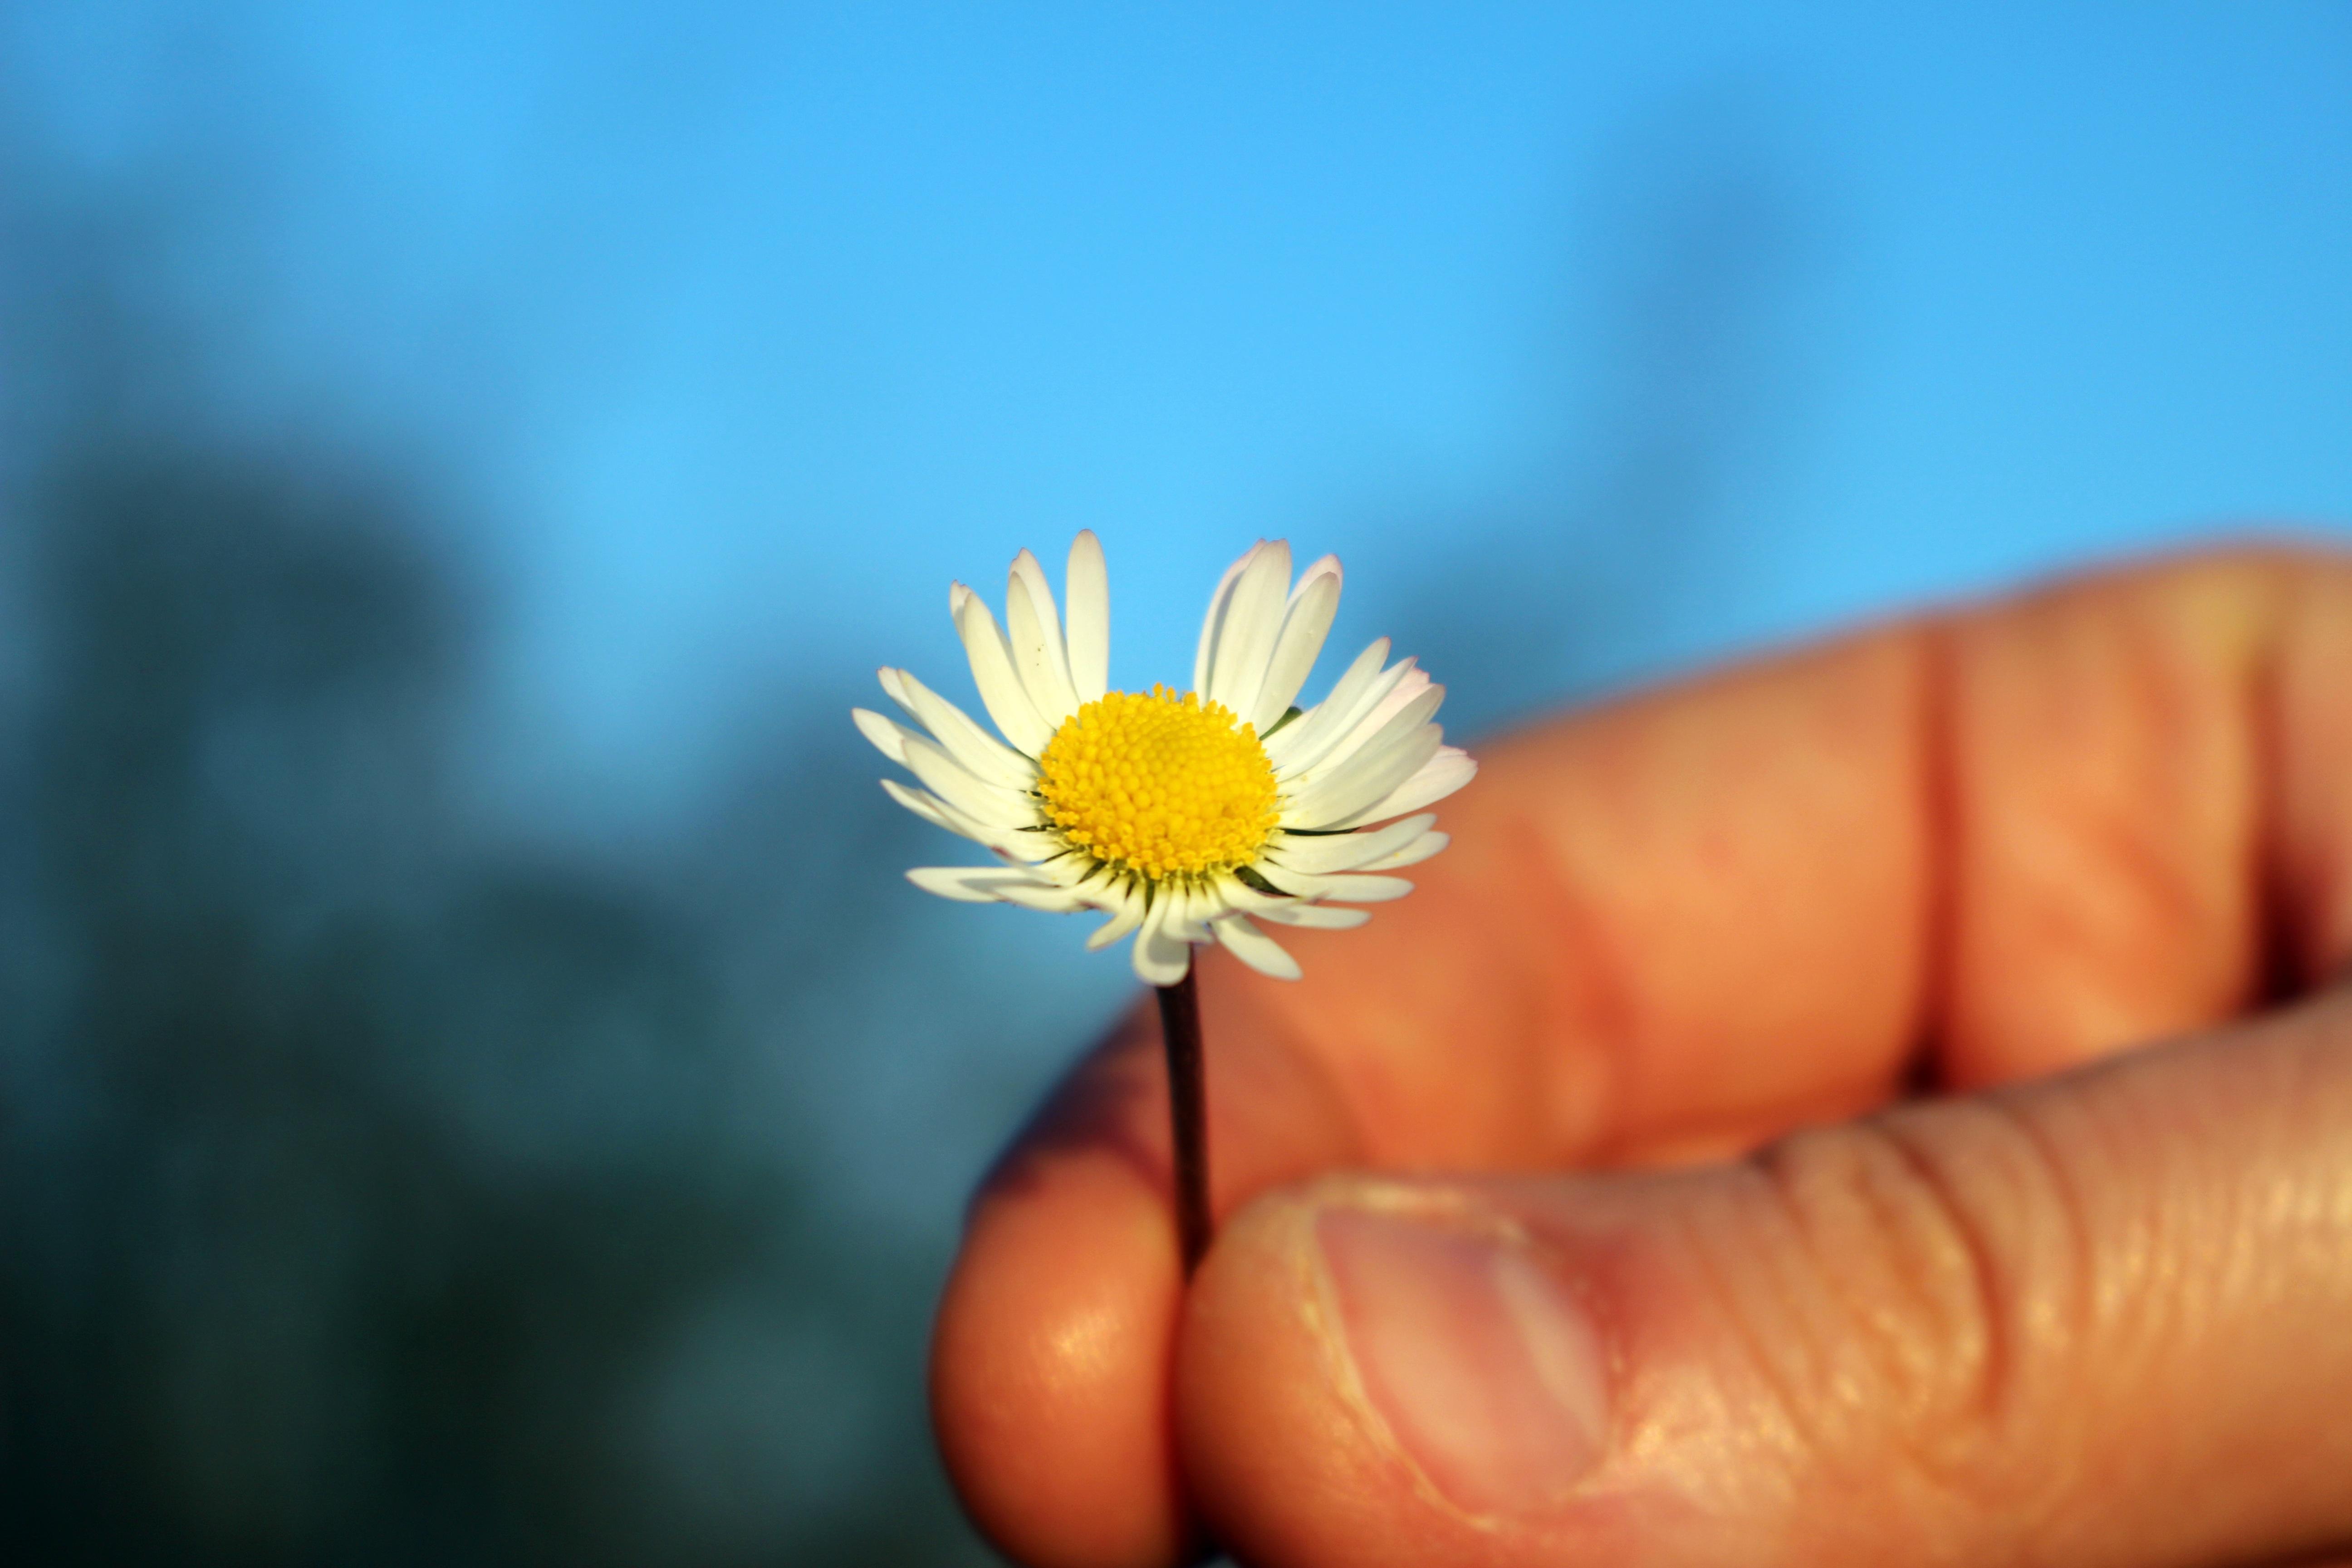 Gambar Menanam Sinar Matahari Daun Bunga Biru Kuning Flora